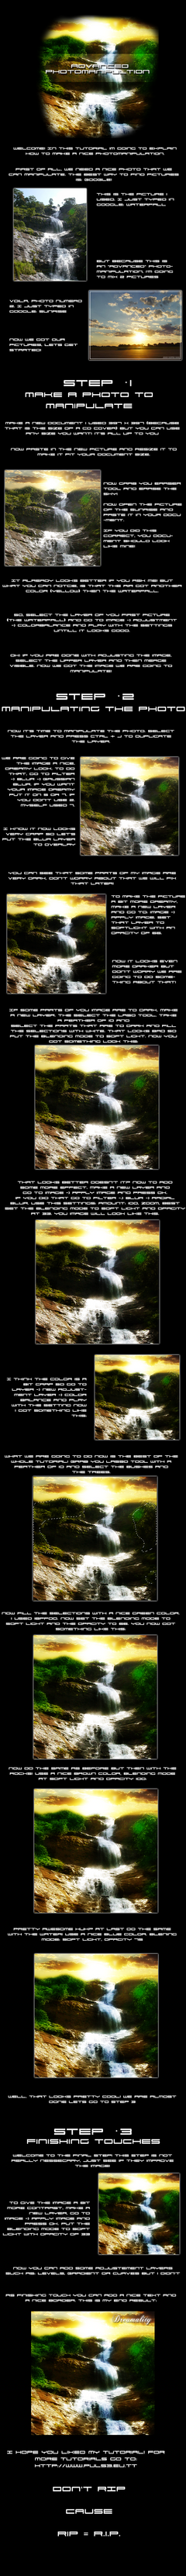 Photo Manipulation Tutorial by puls-3